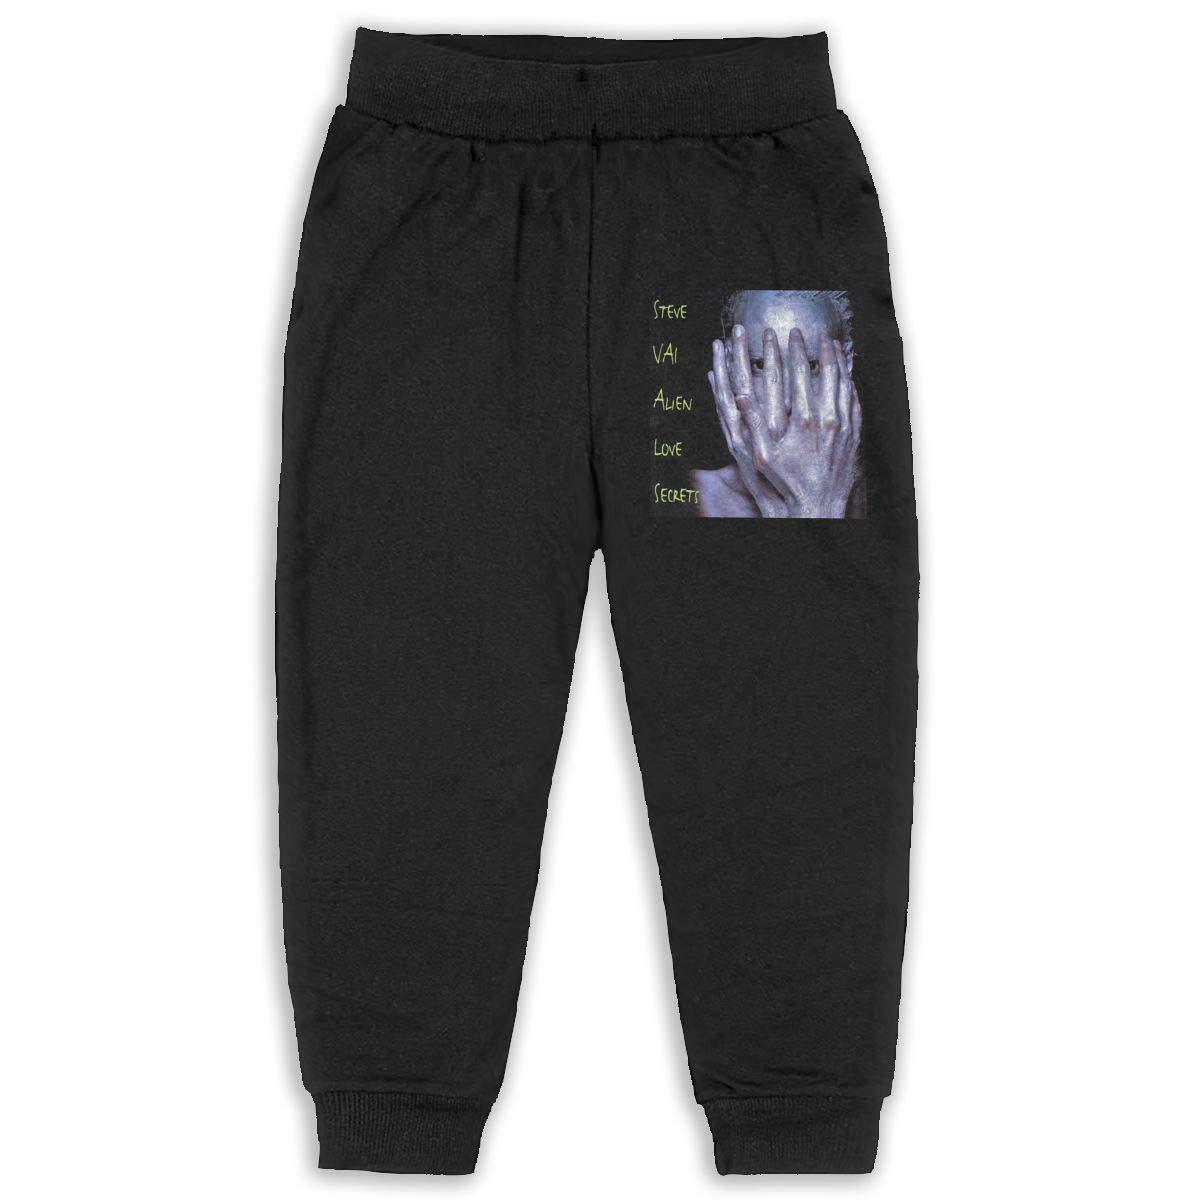 Kids Steve Vai Ailen Love Secrets Music Band Boys Girls Sweatpants Basic Jogger Pants Back Pocket Black